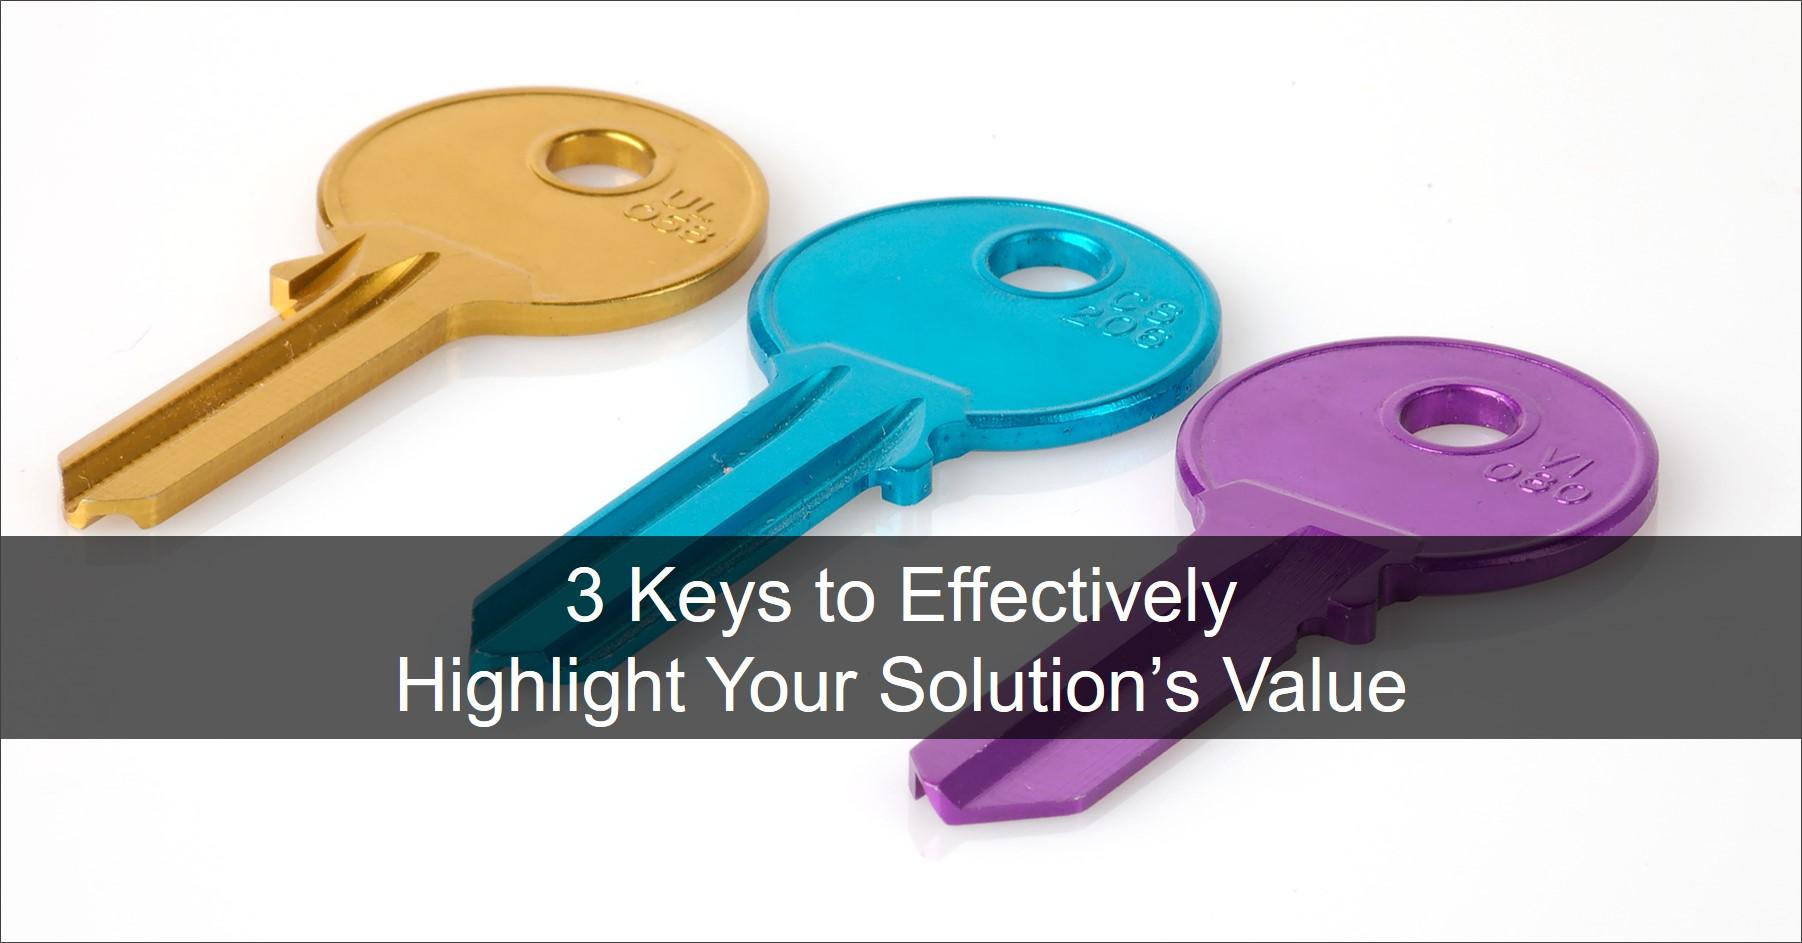 3 Keys to Highlight B2B Business Value